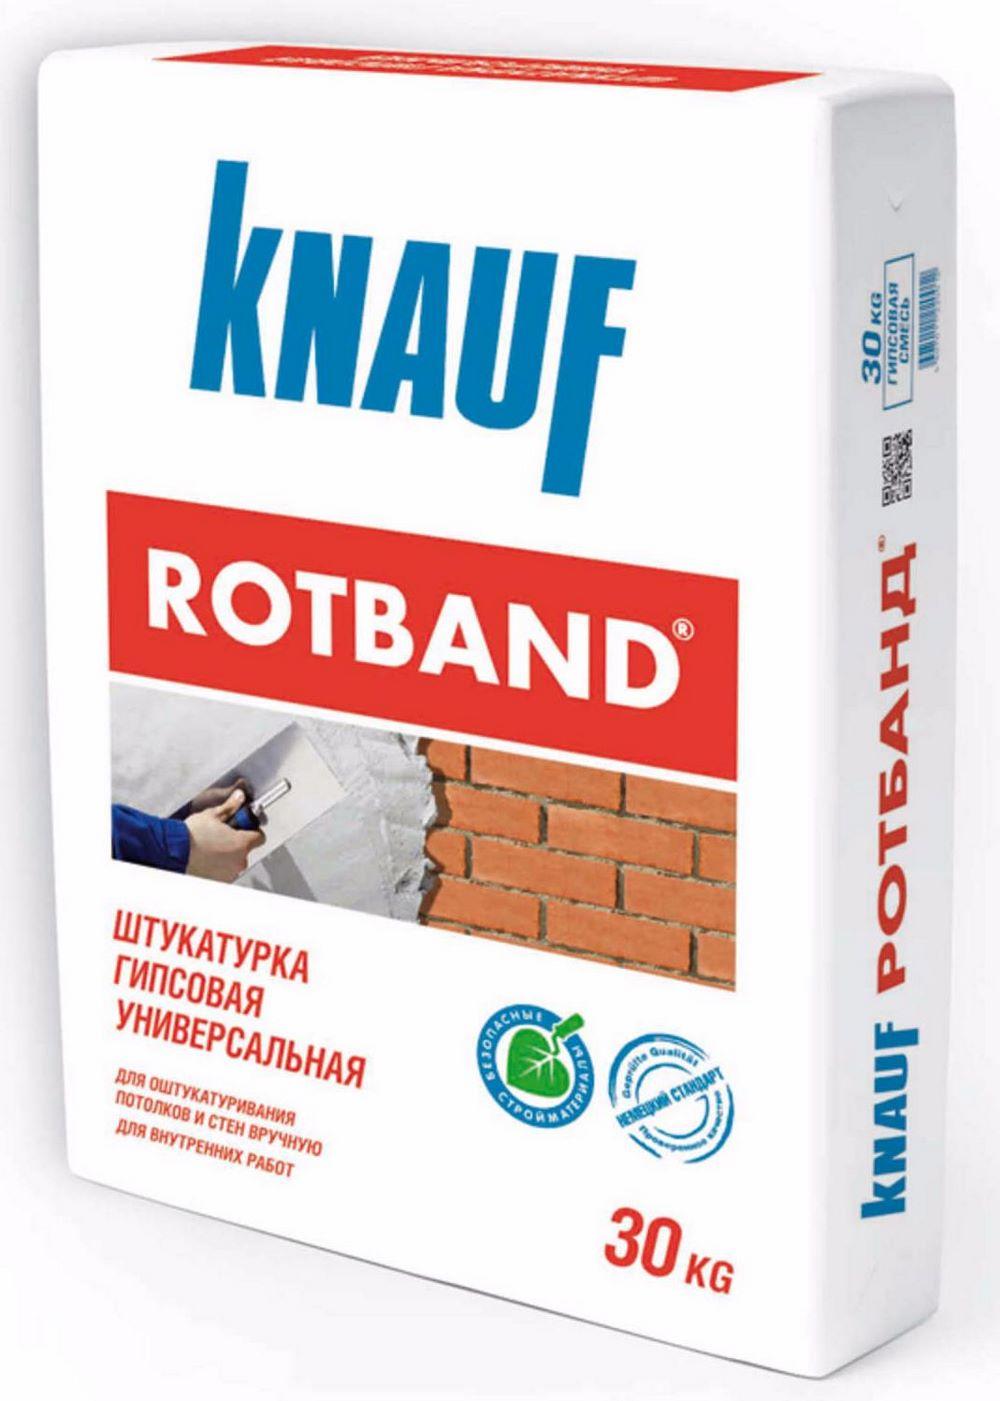 Штукатурка Гипсовая KNAUFRotband, 30 кг